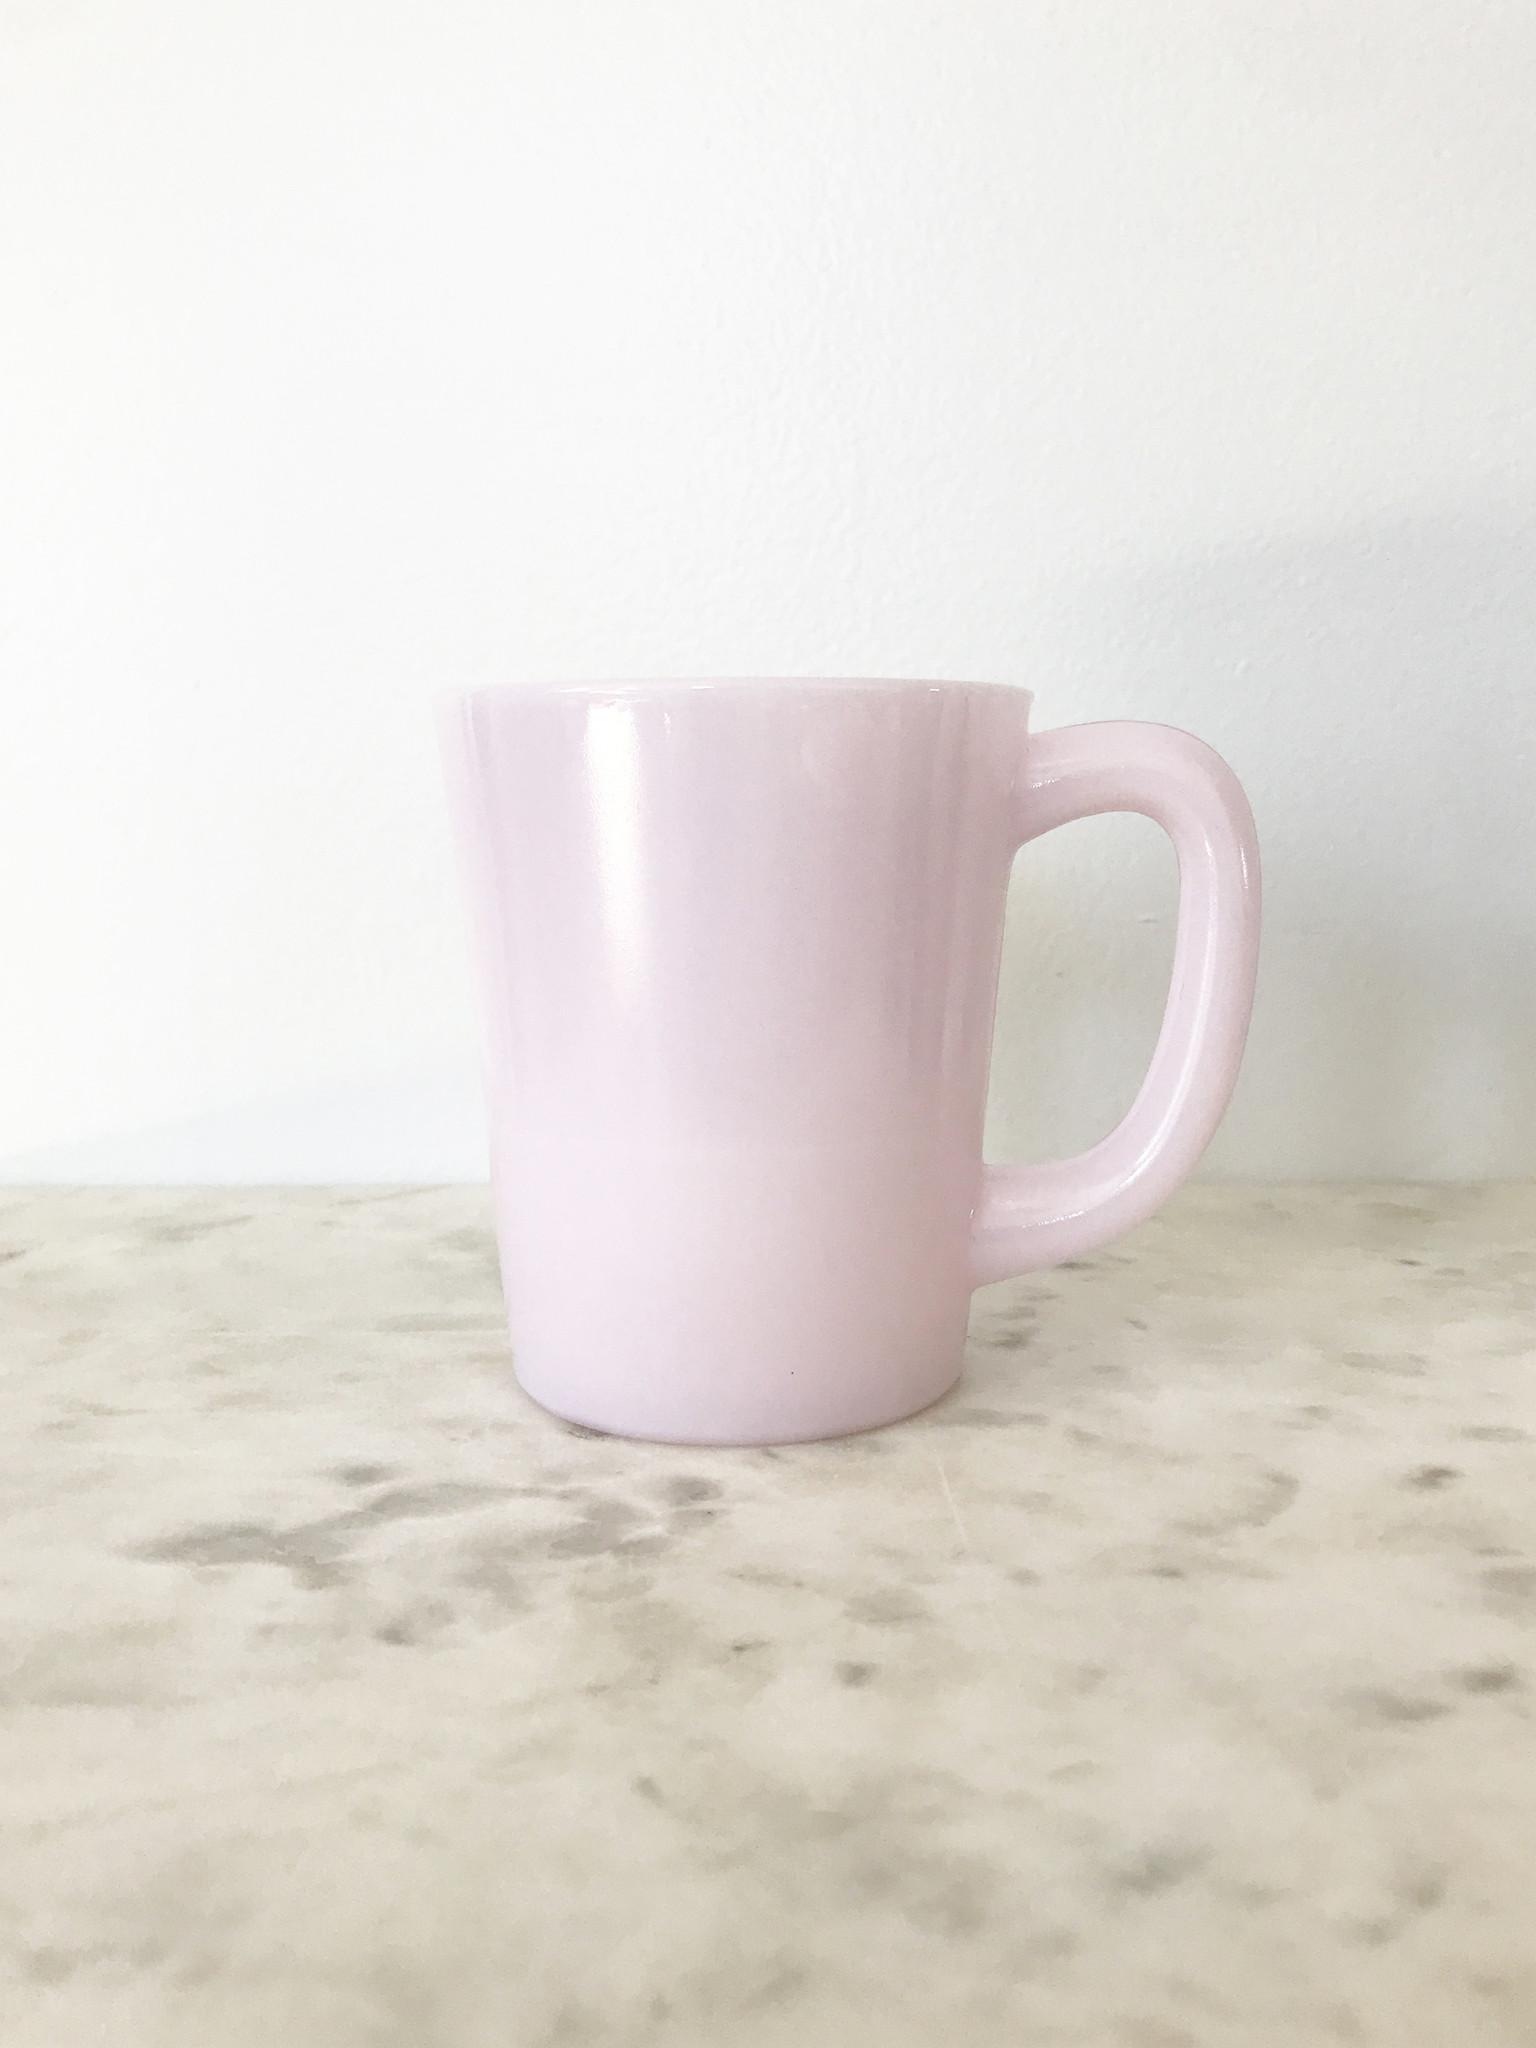 Mosser Glass Mug, 9 oz.-2